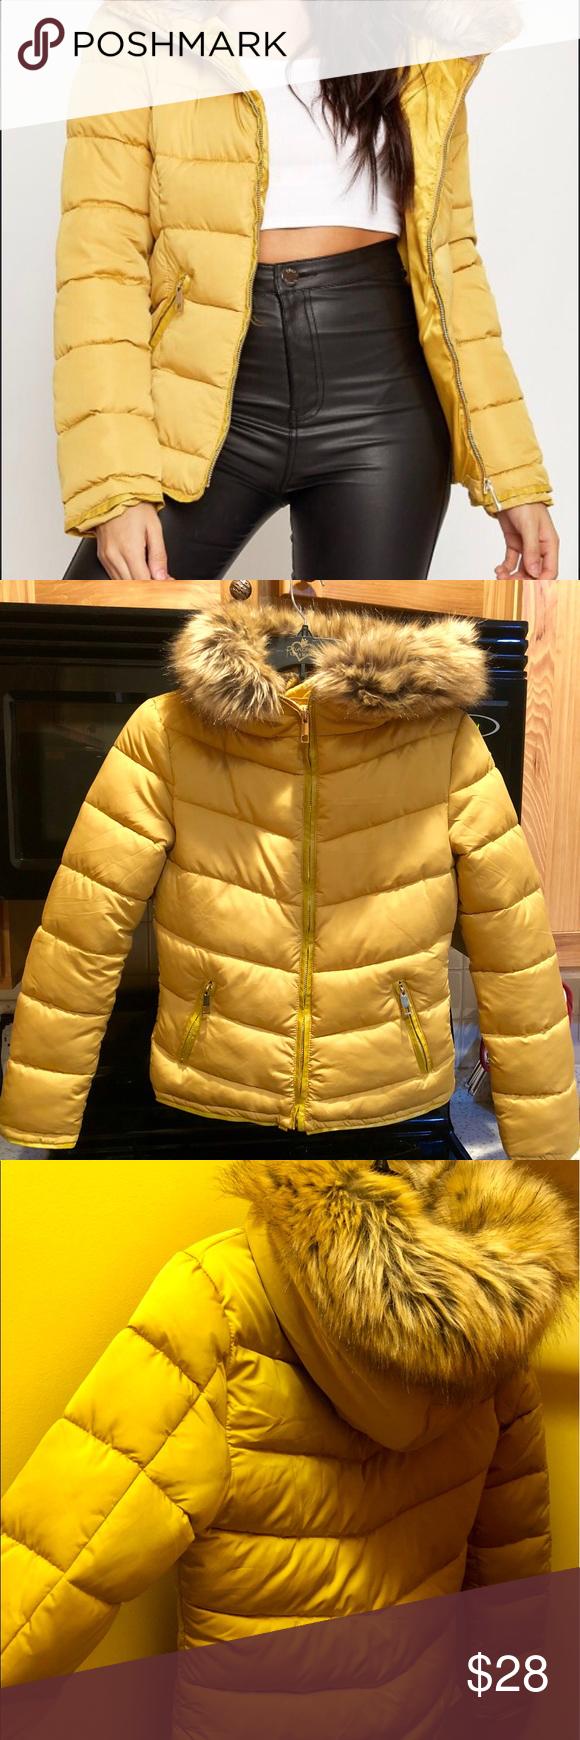 Mustard Gold Puffer Jacket Faux Fur Hood Zippers Faux Fur Hood Faux Fur Jacket Puffer Jackets [ 1740 x 580 Pixel ]